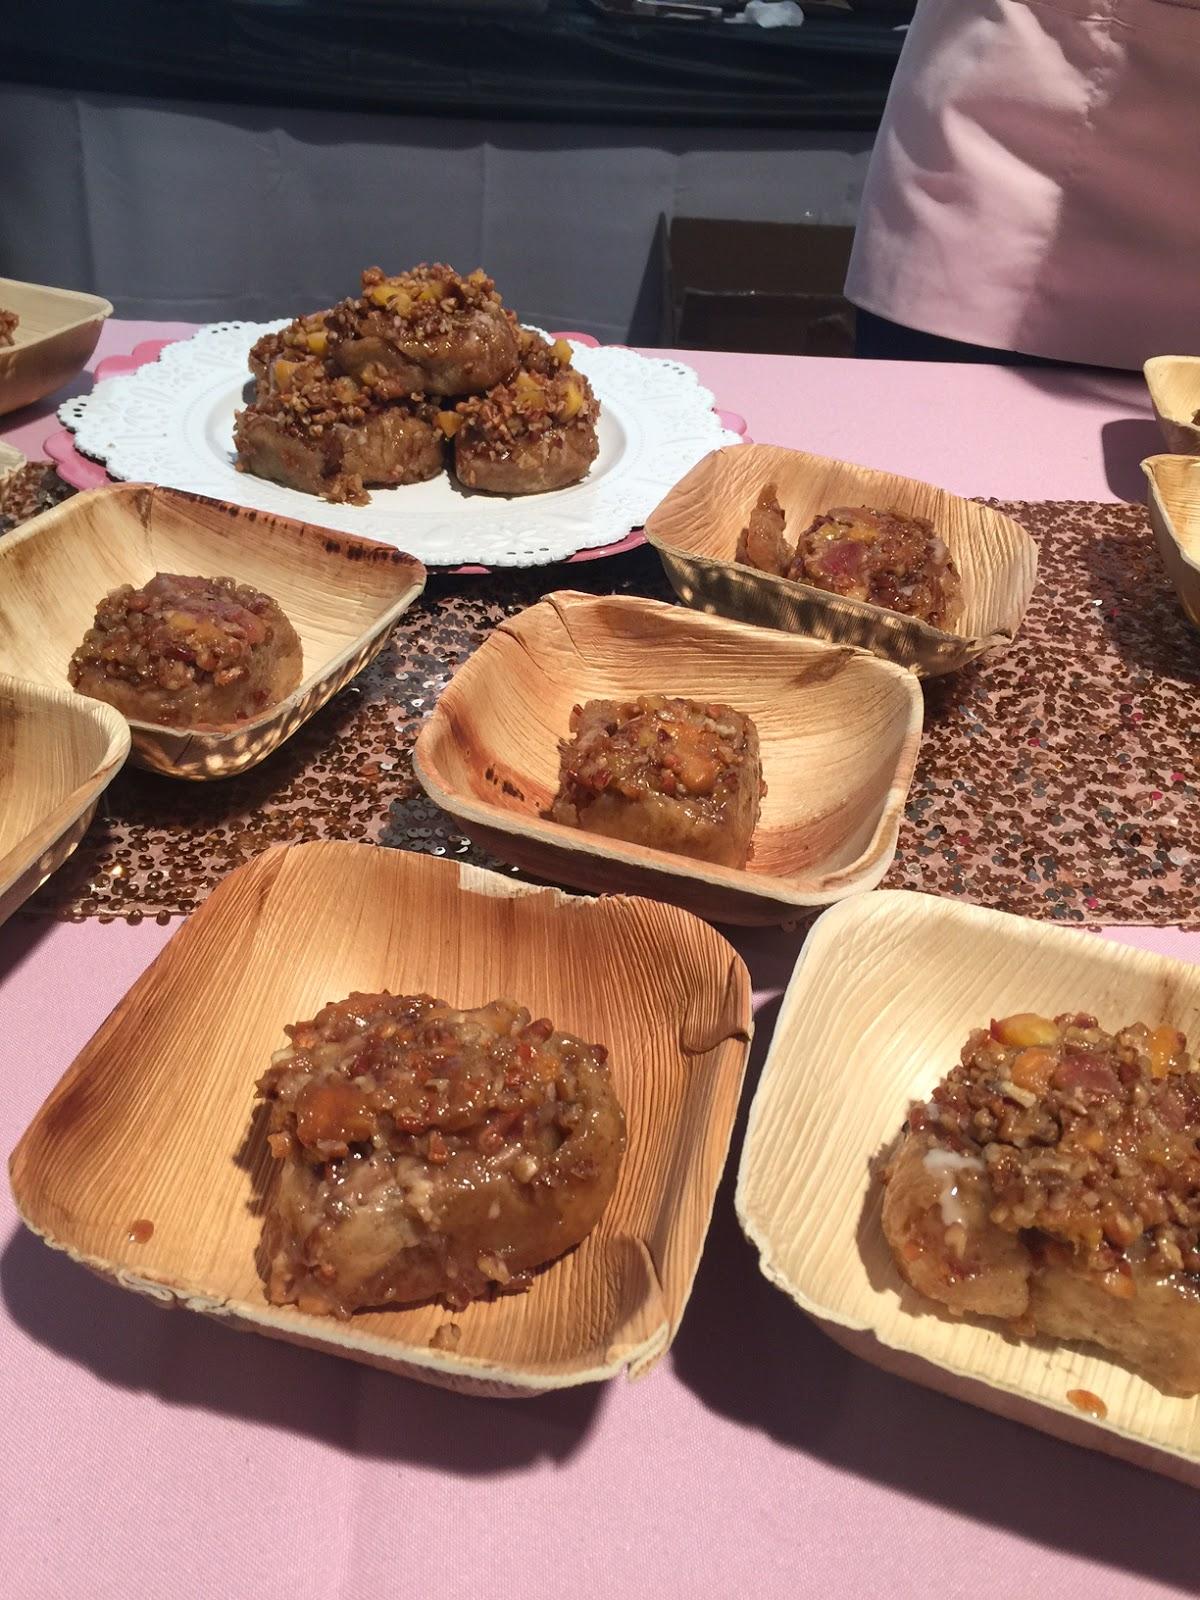 portland events, feast pdx, feast portland, portland blogger, portland lifestyle blogger, pdx foodie, food festival,